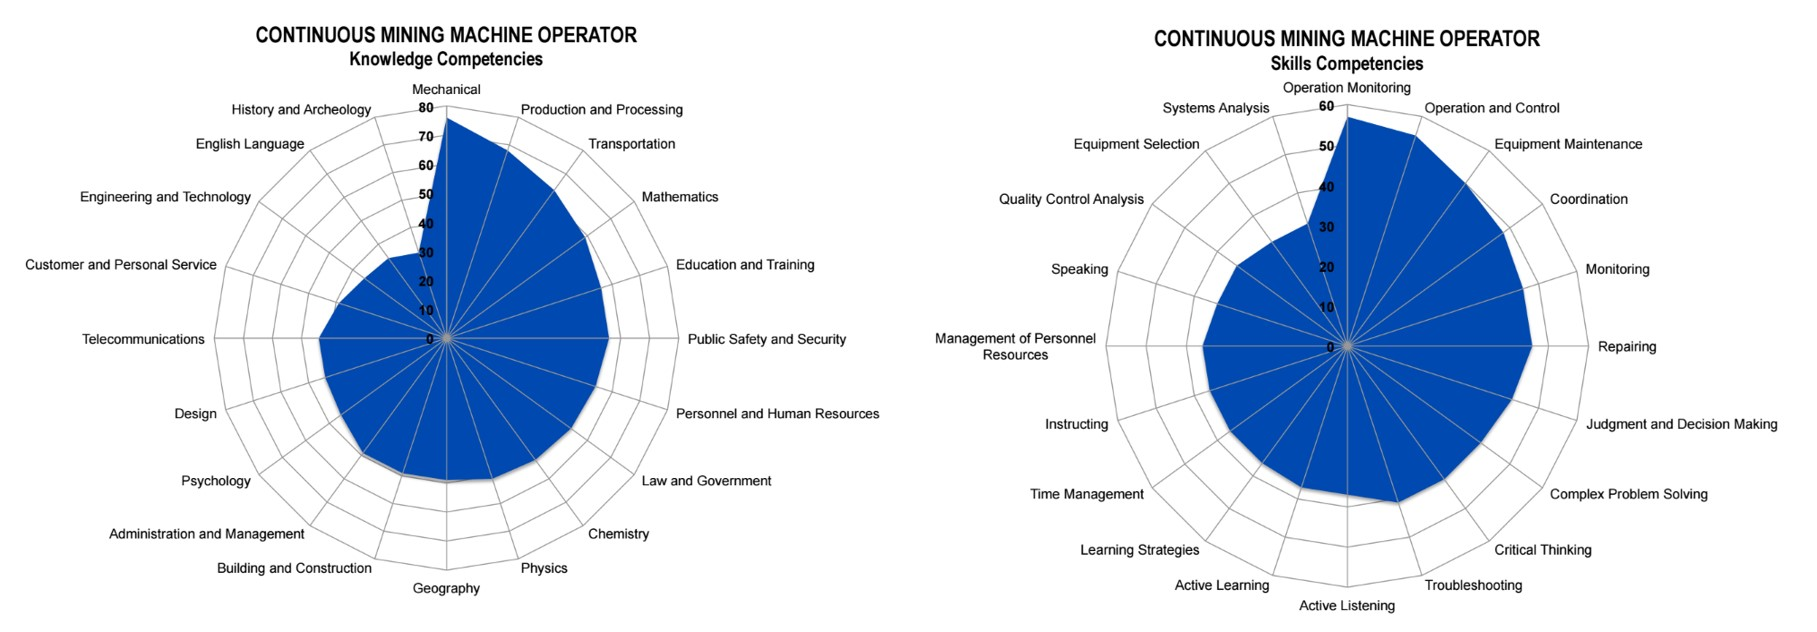 Machine Operator Competencies